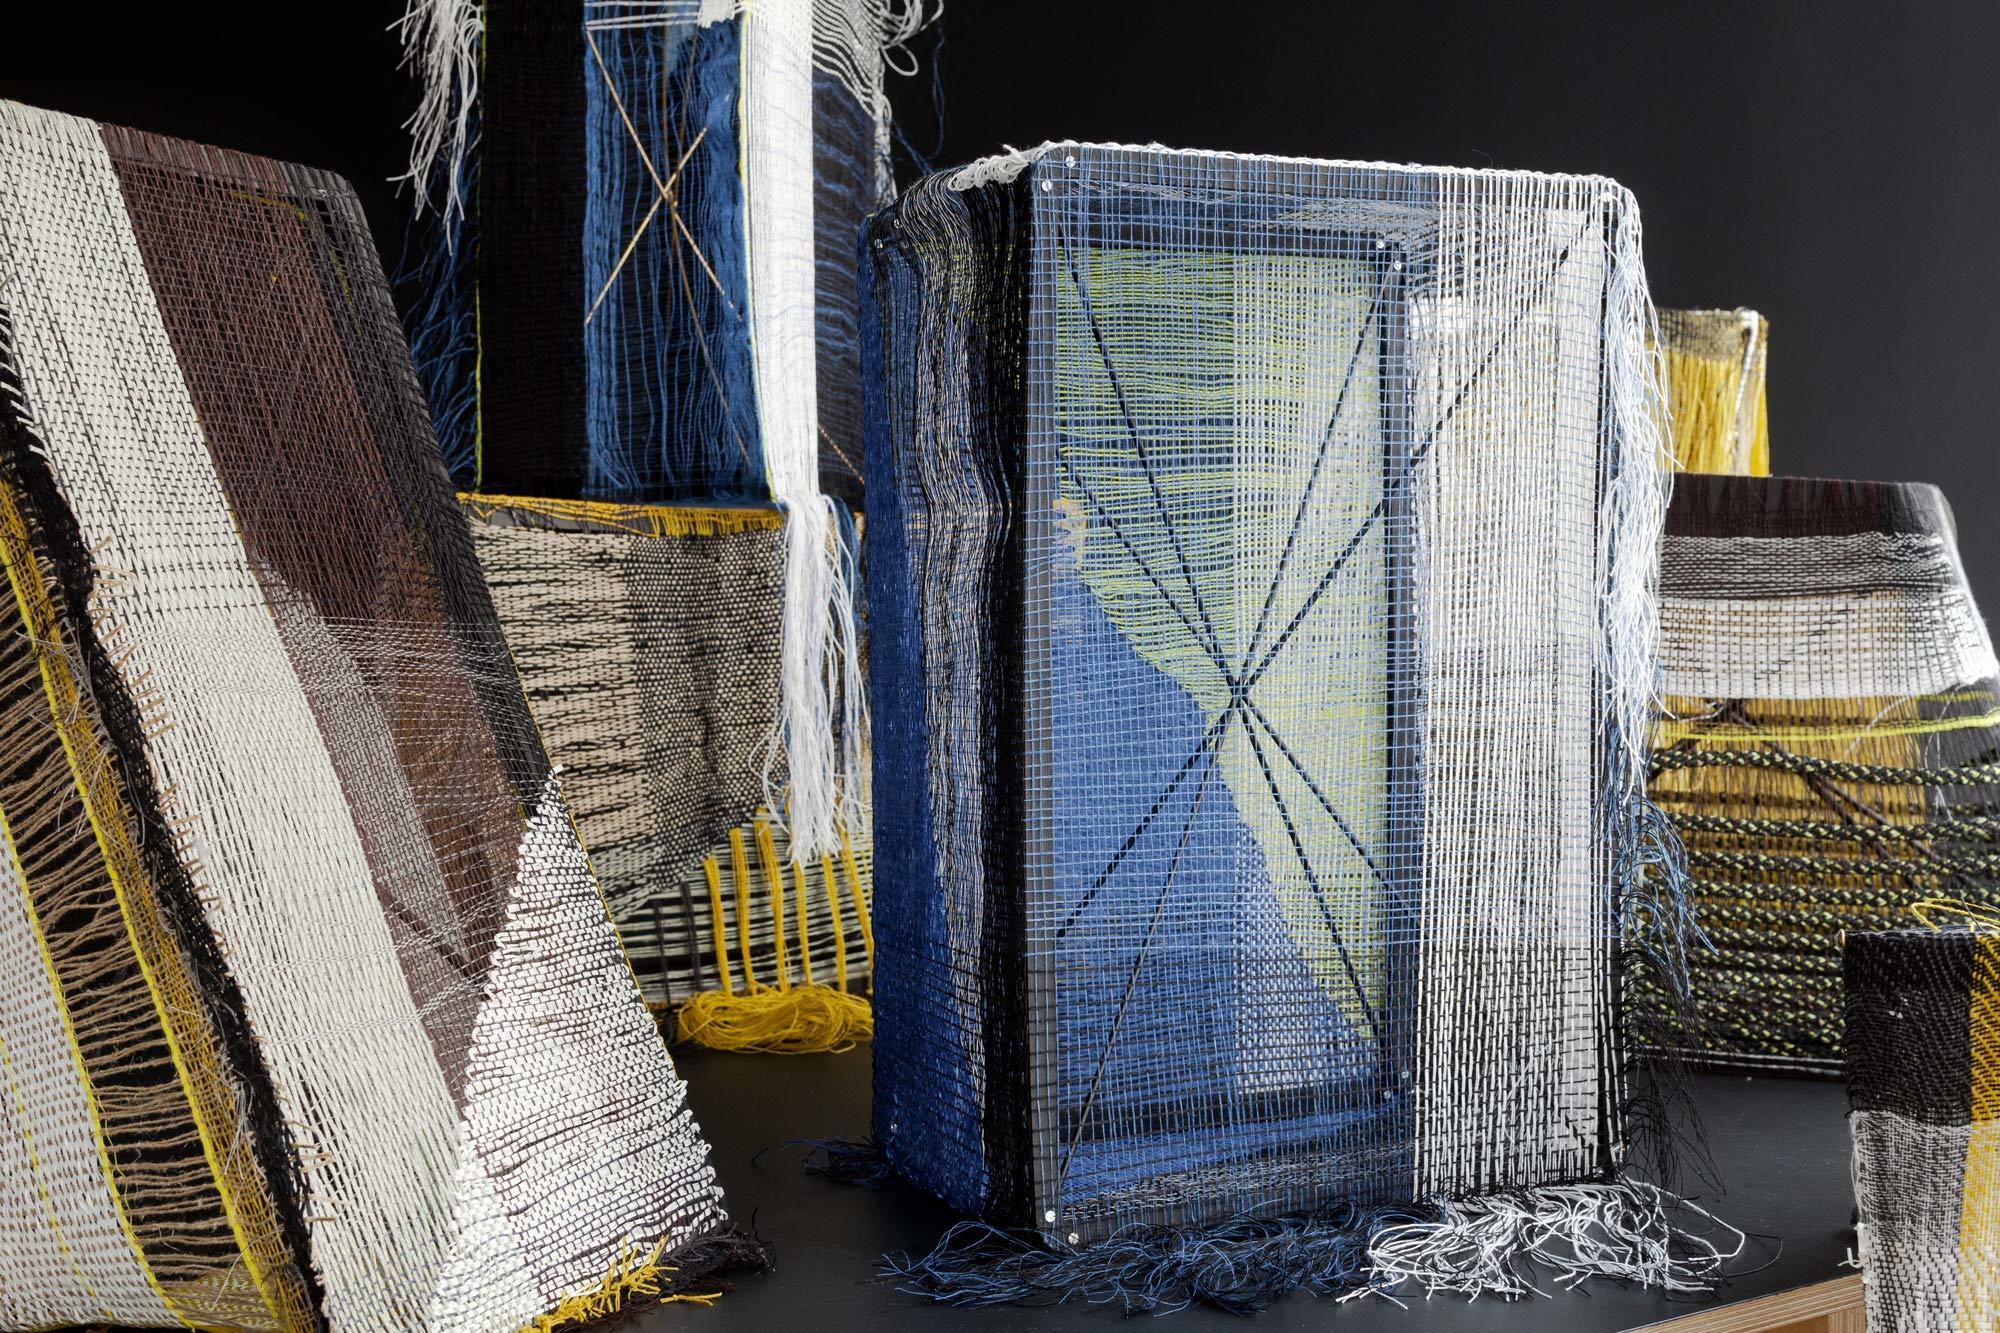 Hella Jongerius, Woven Bricks, 2019© Hella Jongerius / VG Bild-Kunst, Bonn Courtesy: Lafayette Anticipations, Foto: Roel van Tour